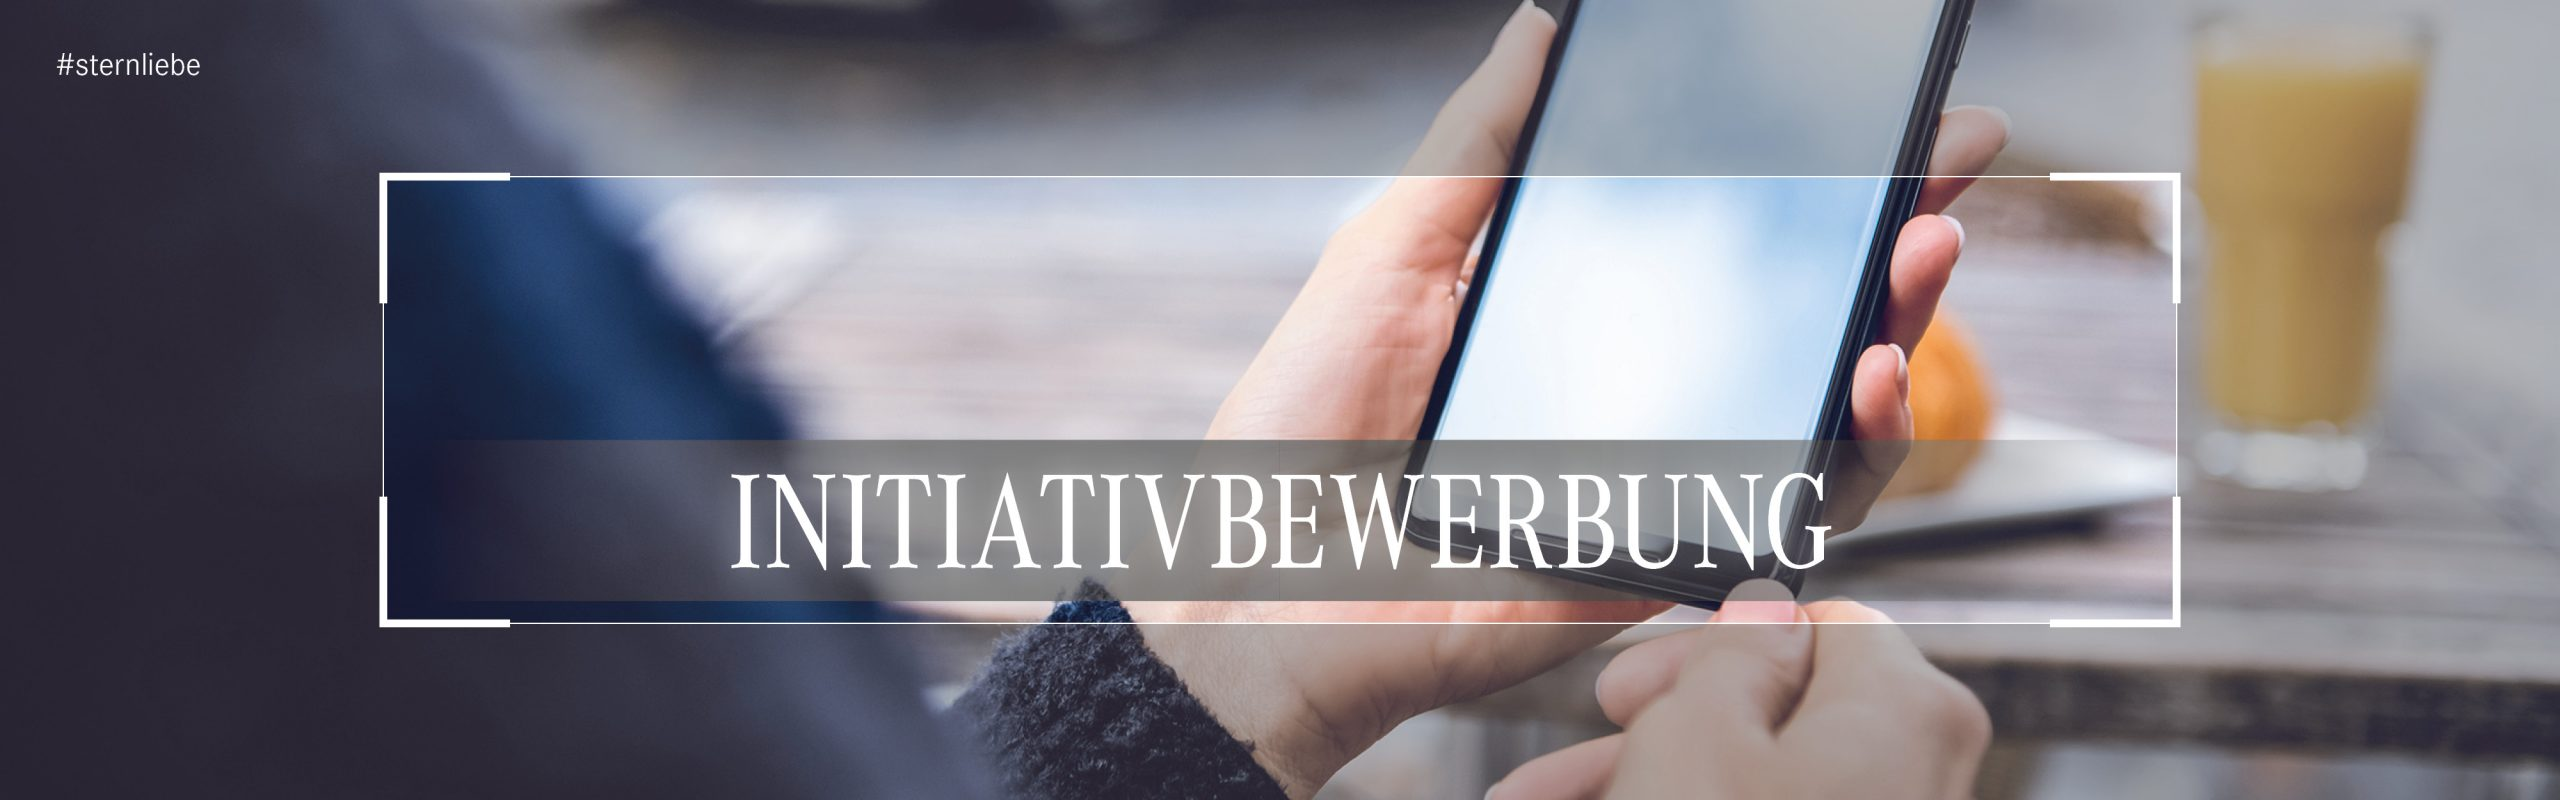 Banner-Initiativbewerbung_Mercedes Benz Brinkmann